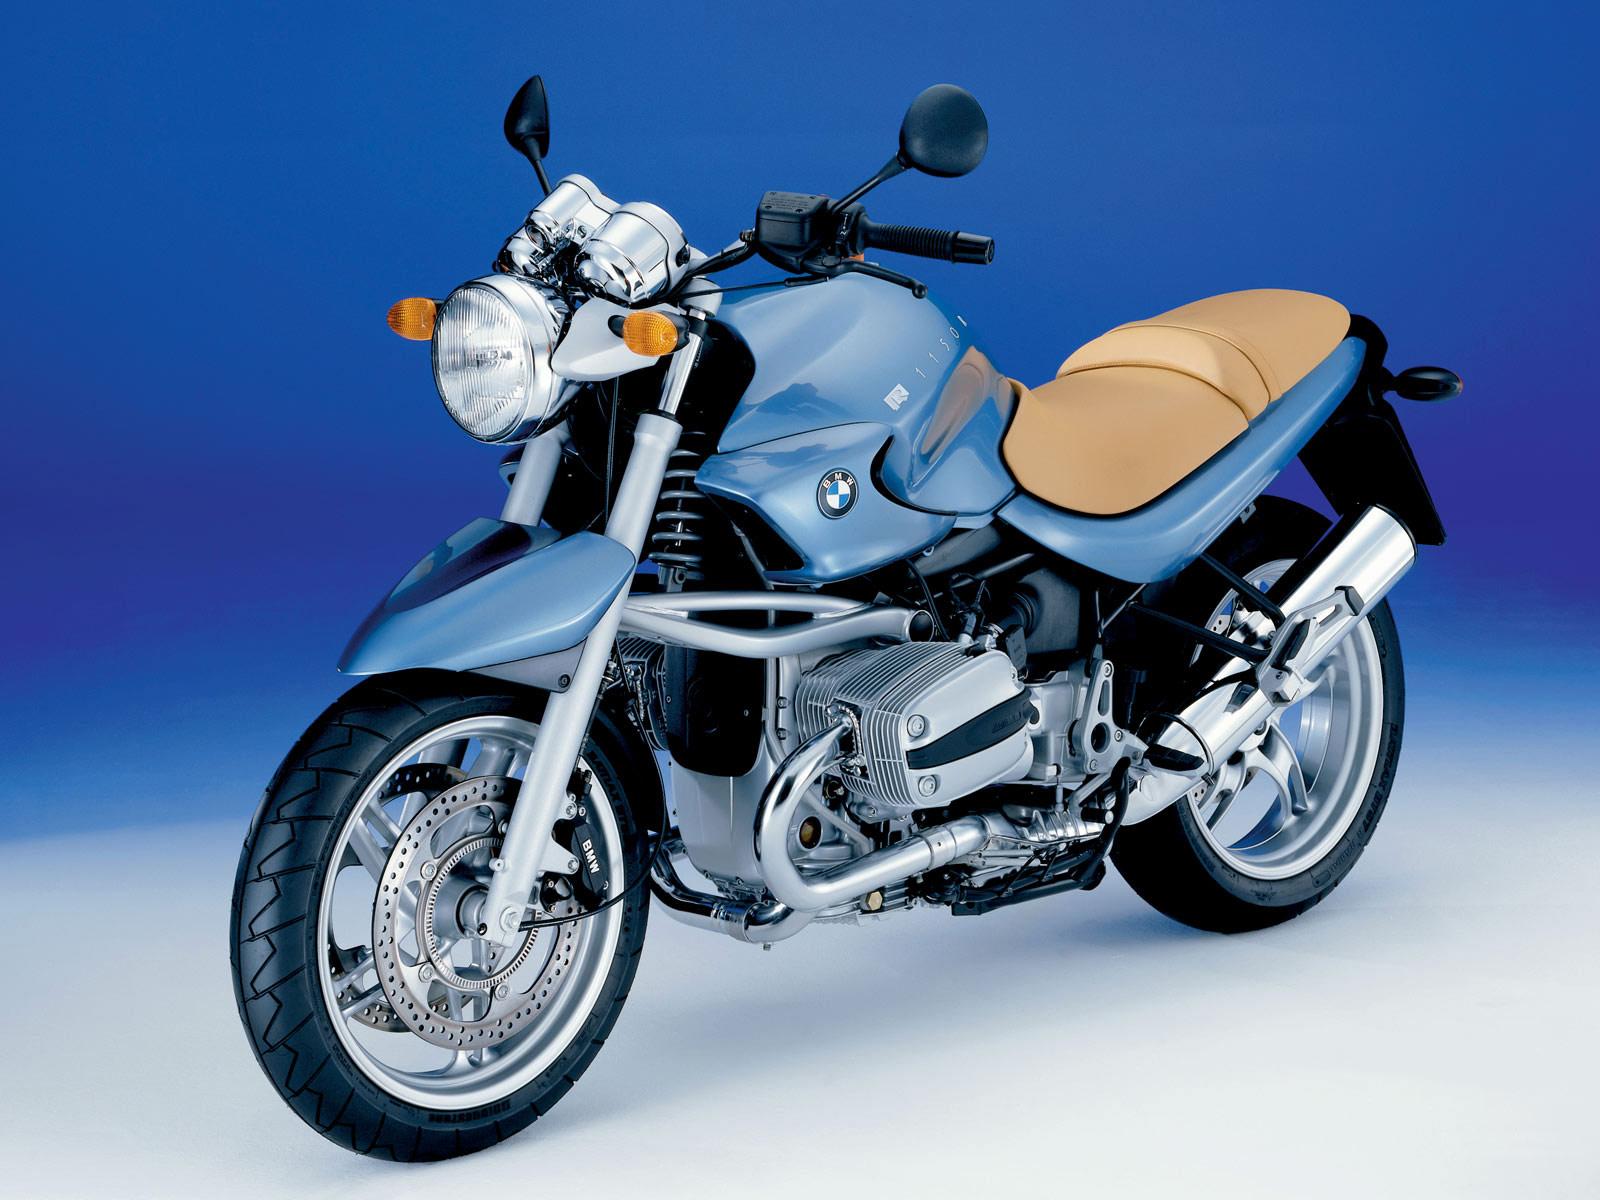 2000 BMW R1150R insurance info Motorcycle Desktop Wallpaper 1600x1200